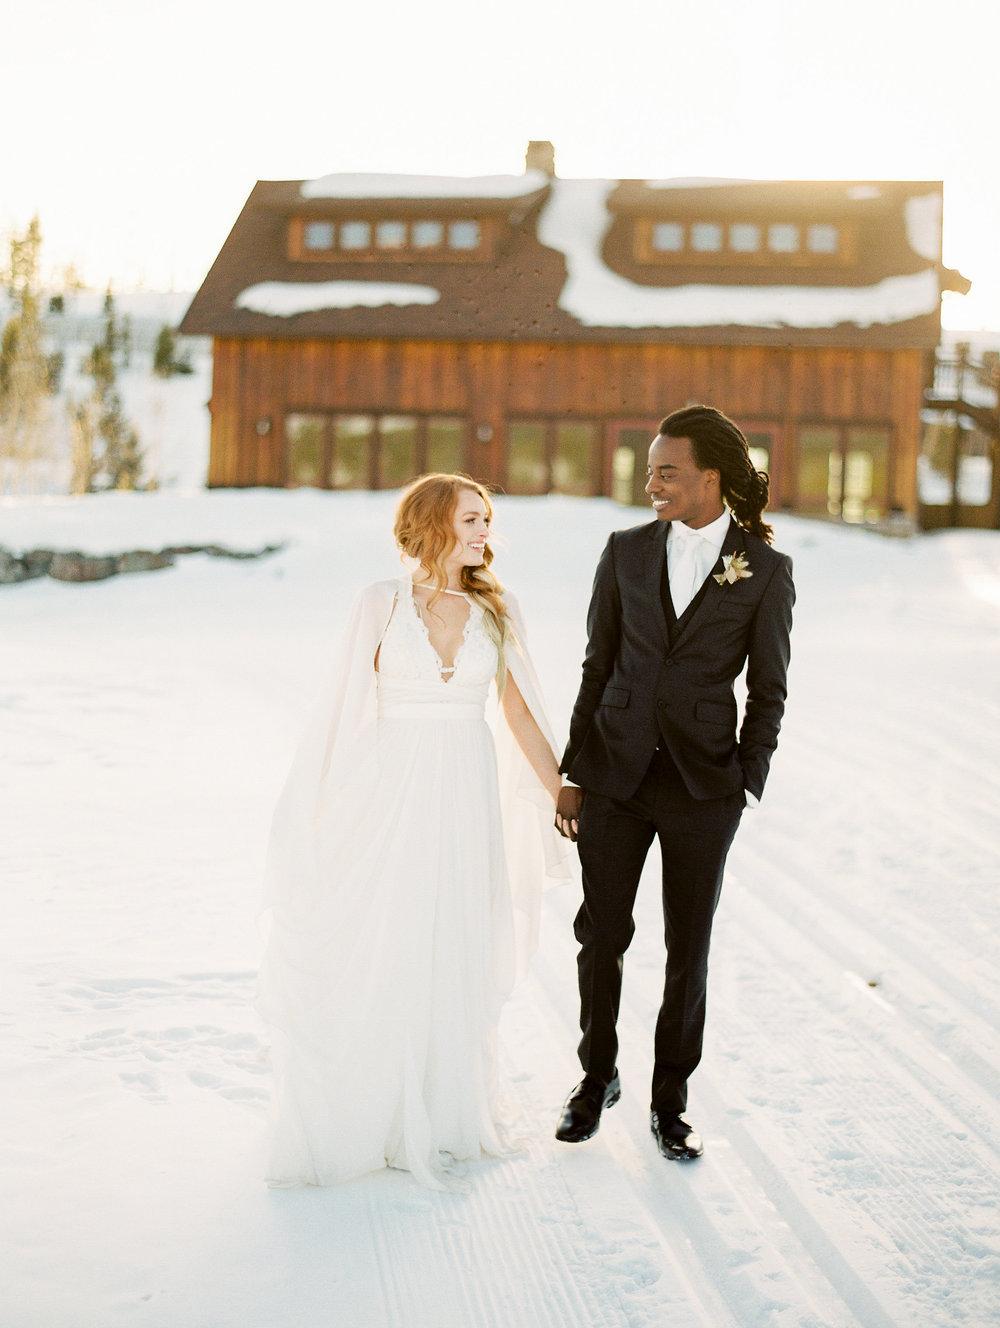 Dani-Cowan-Photography-Devils-Thumb-Ranch-Winter-Luxury-Wedding180.jpg